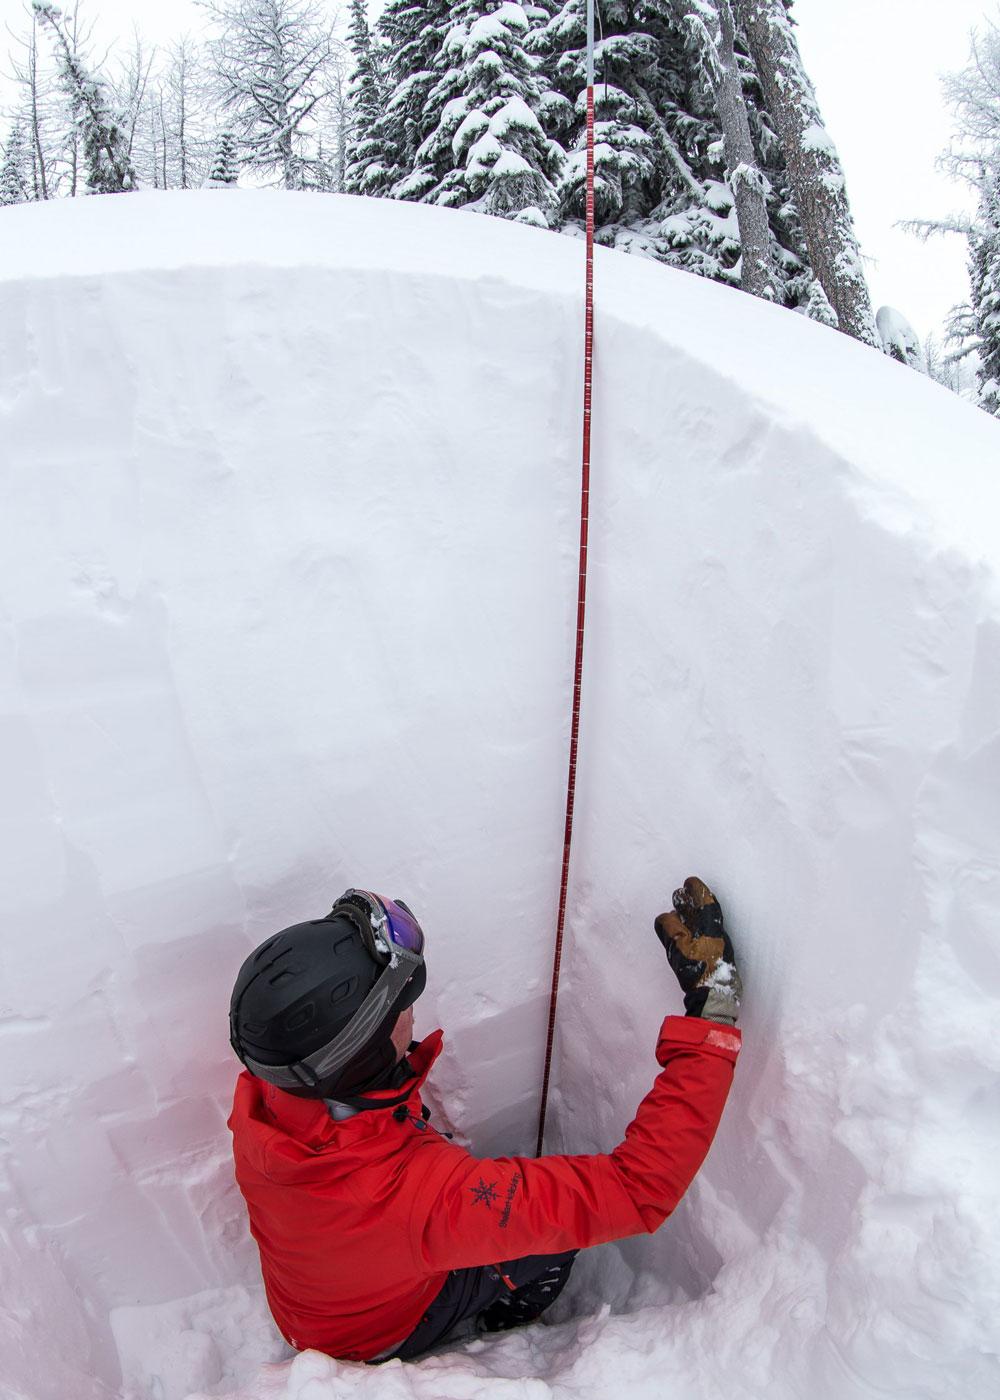 Kootenay Snowcheck from Stellar Heliskiing in Kaslo, BC